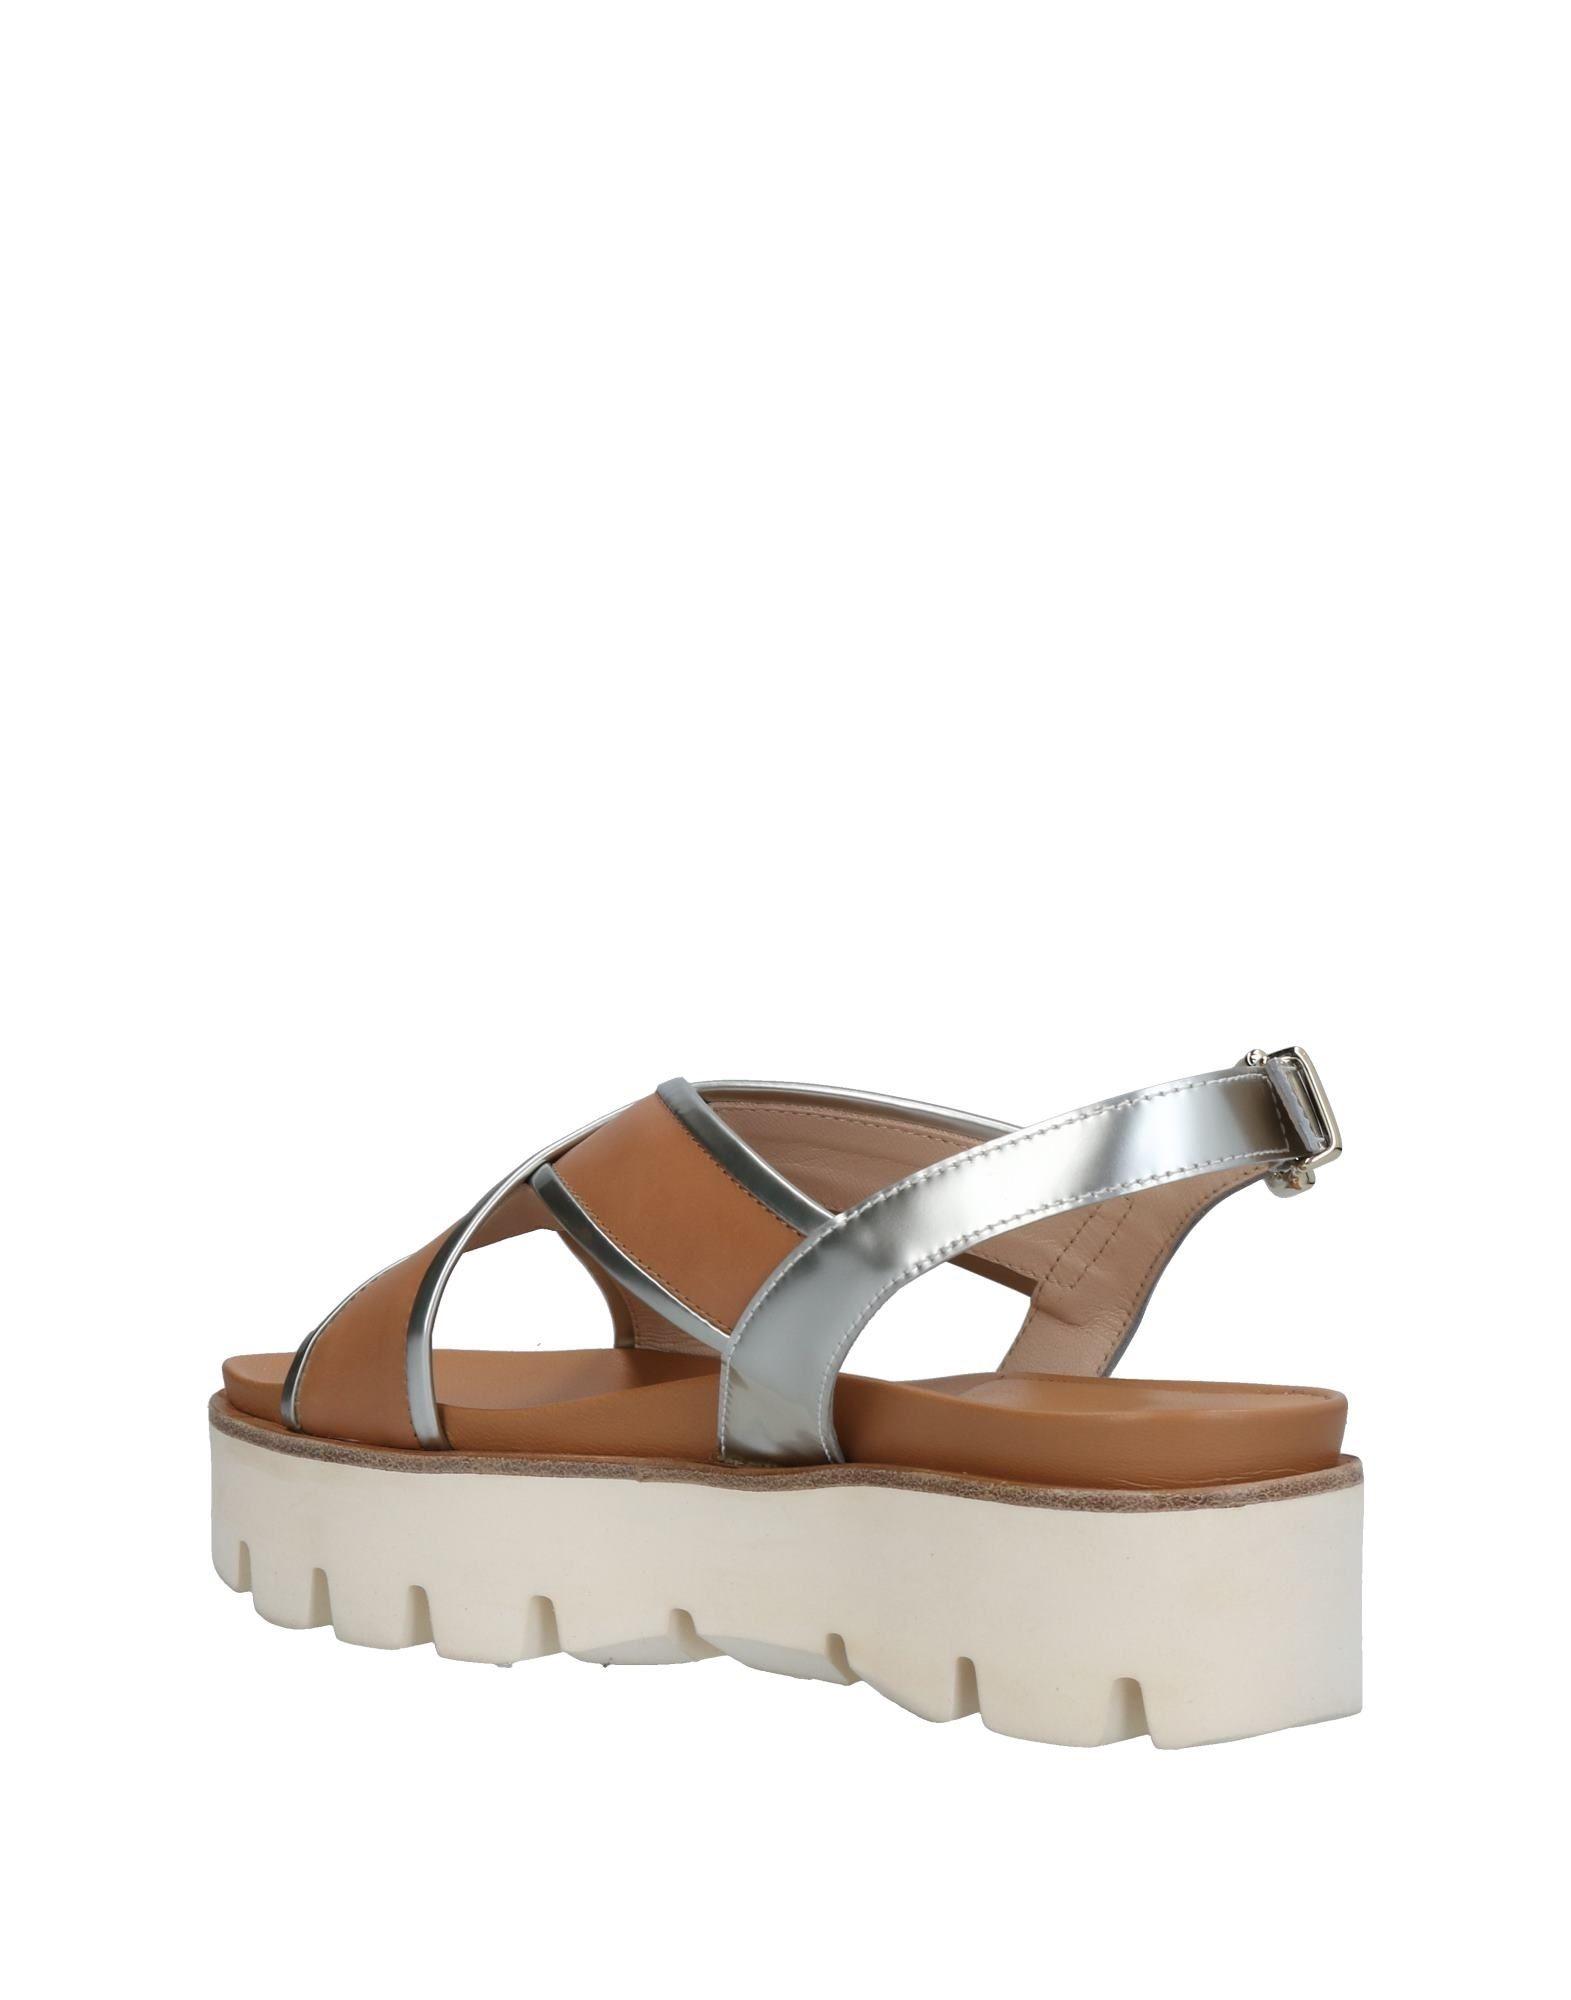 Gut um Sandalen billige Schuhe zu tragenLa Sellerie Sandalen um Damen  11456261KO 40fee4